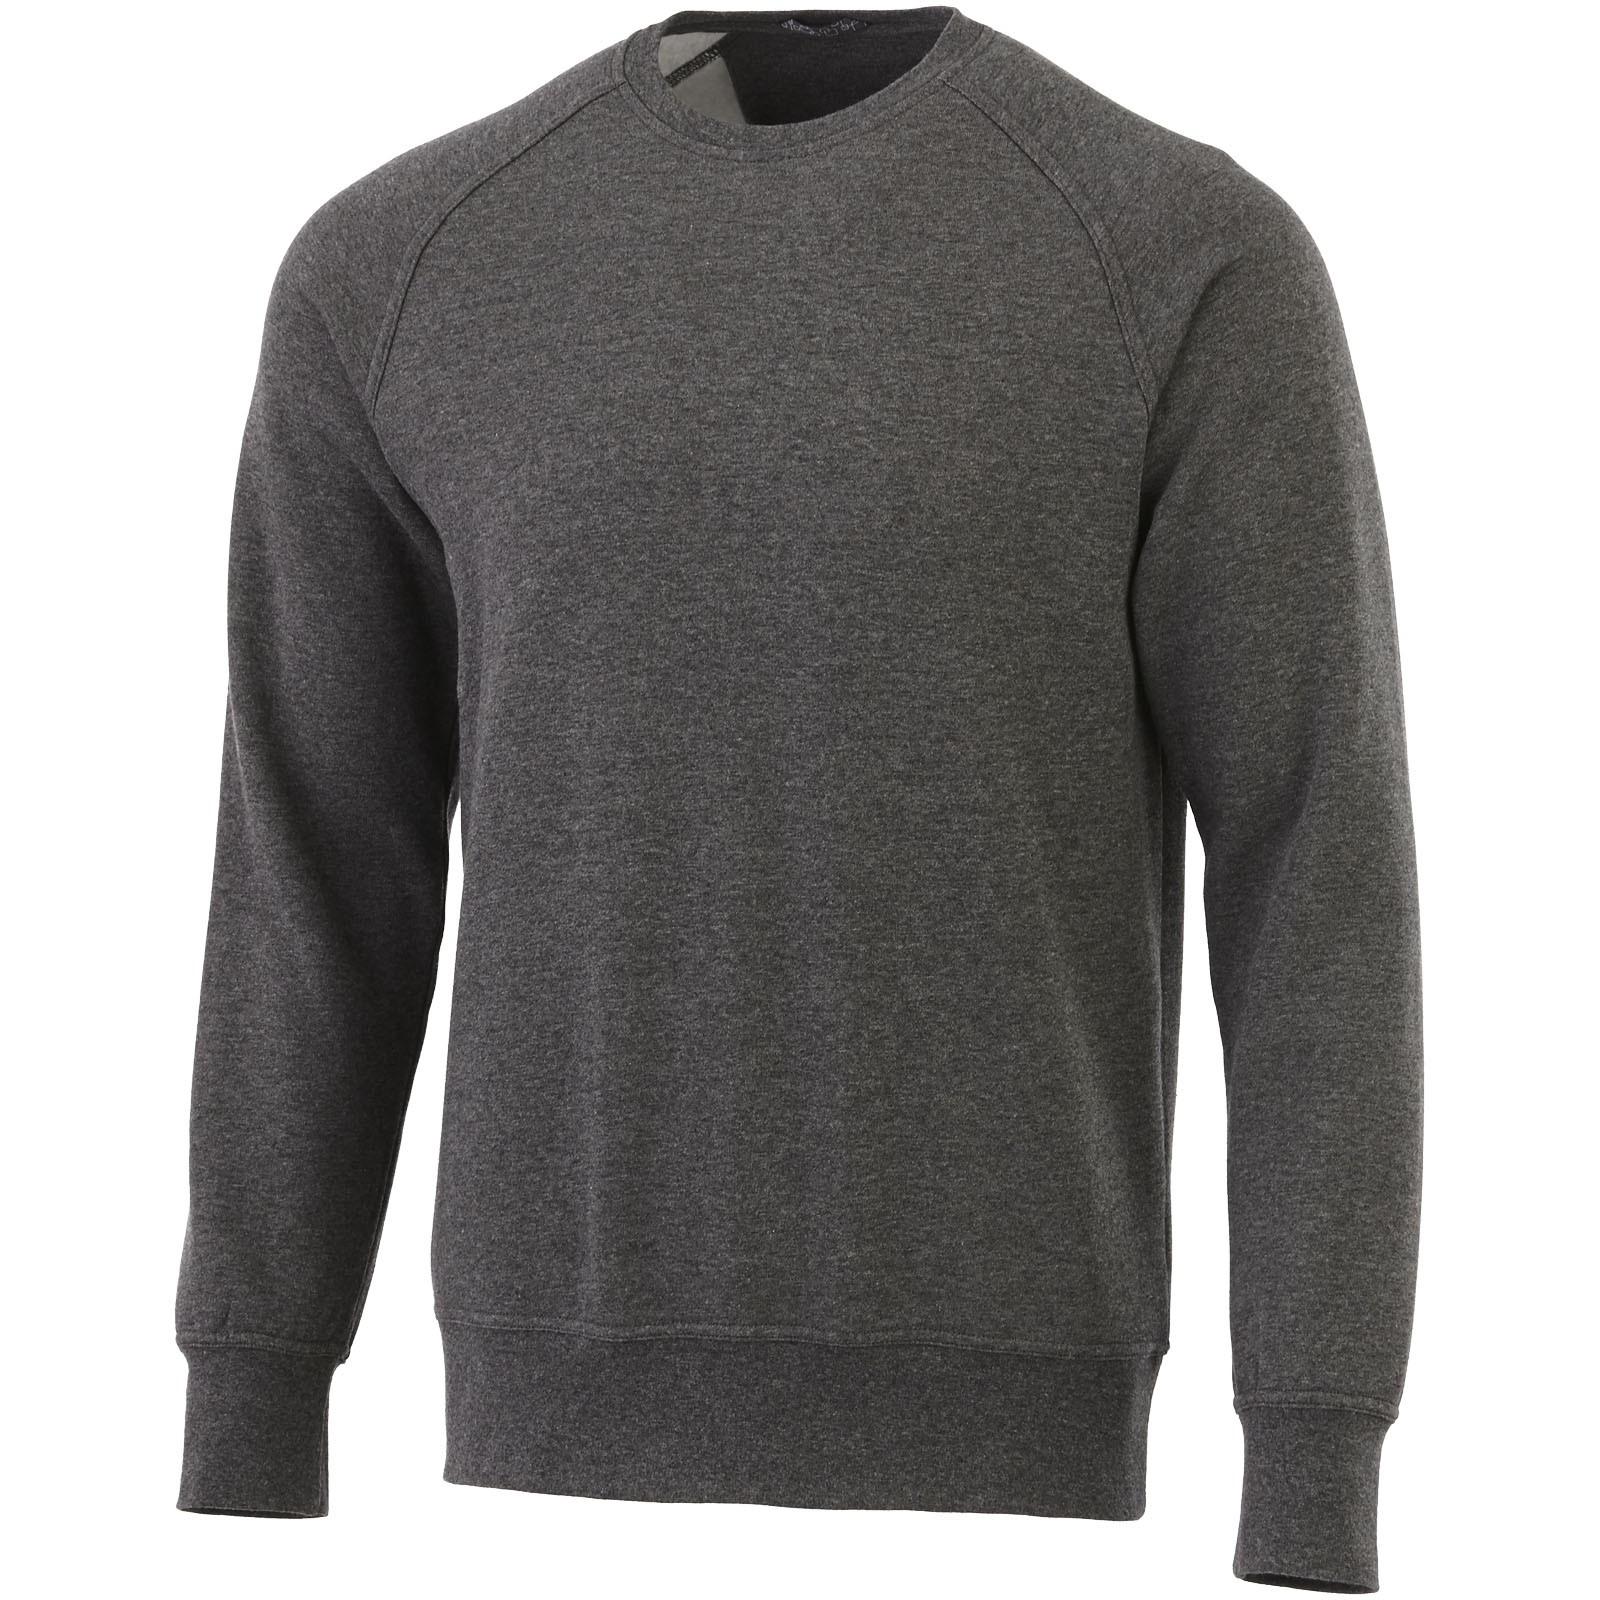 Kruger svetr s kulatým výstřihem - Charcoal / M